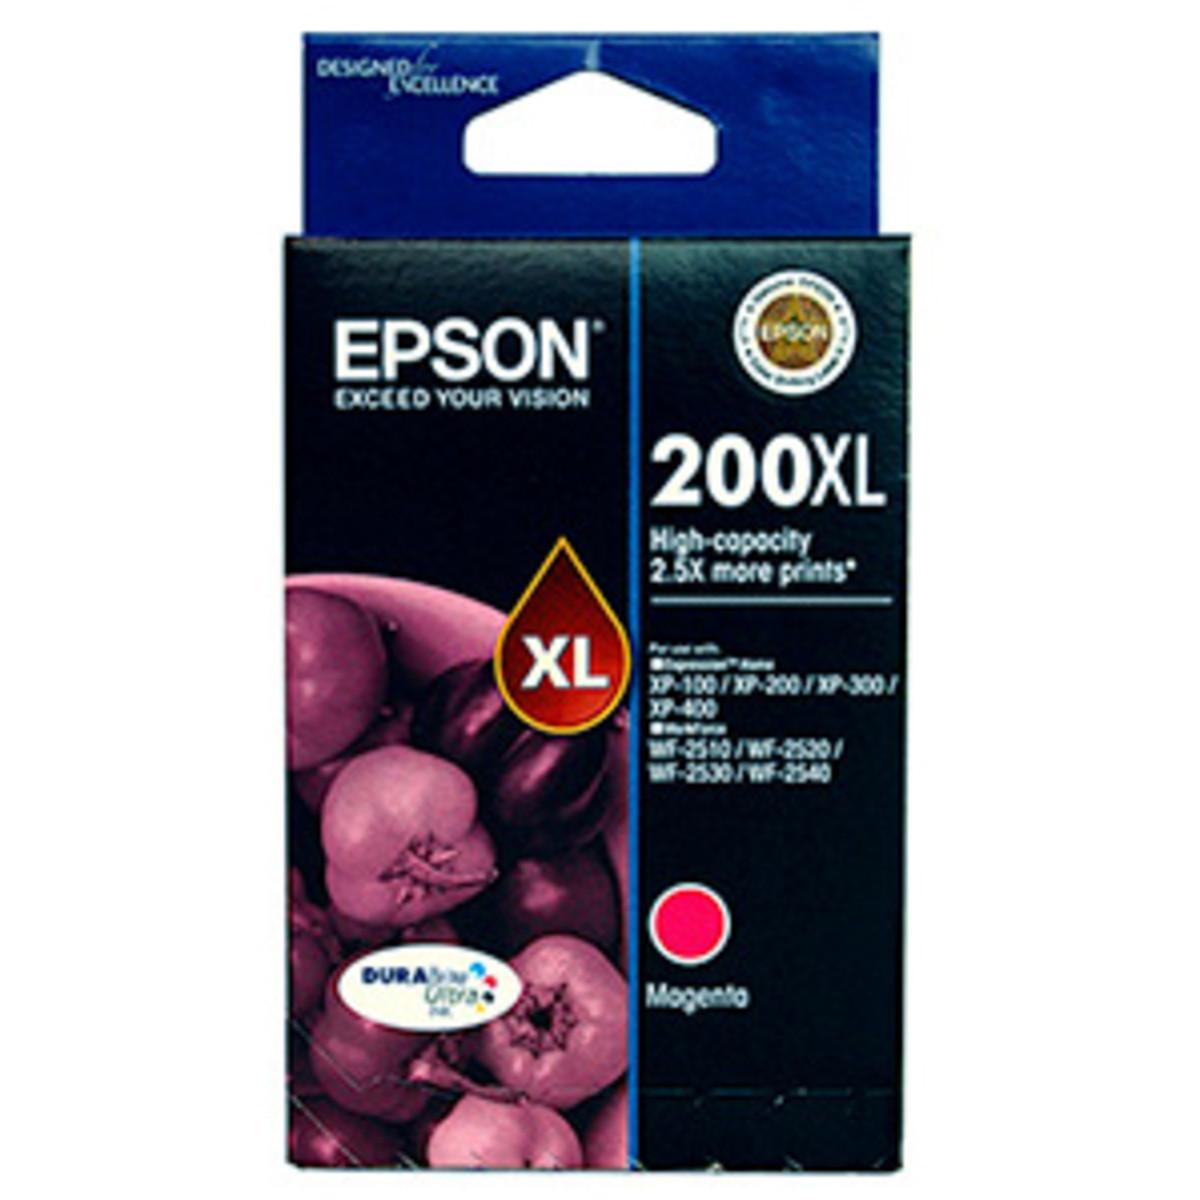 Epson 200XL Magenta Ink Cartridge - High Yield